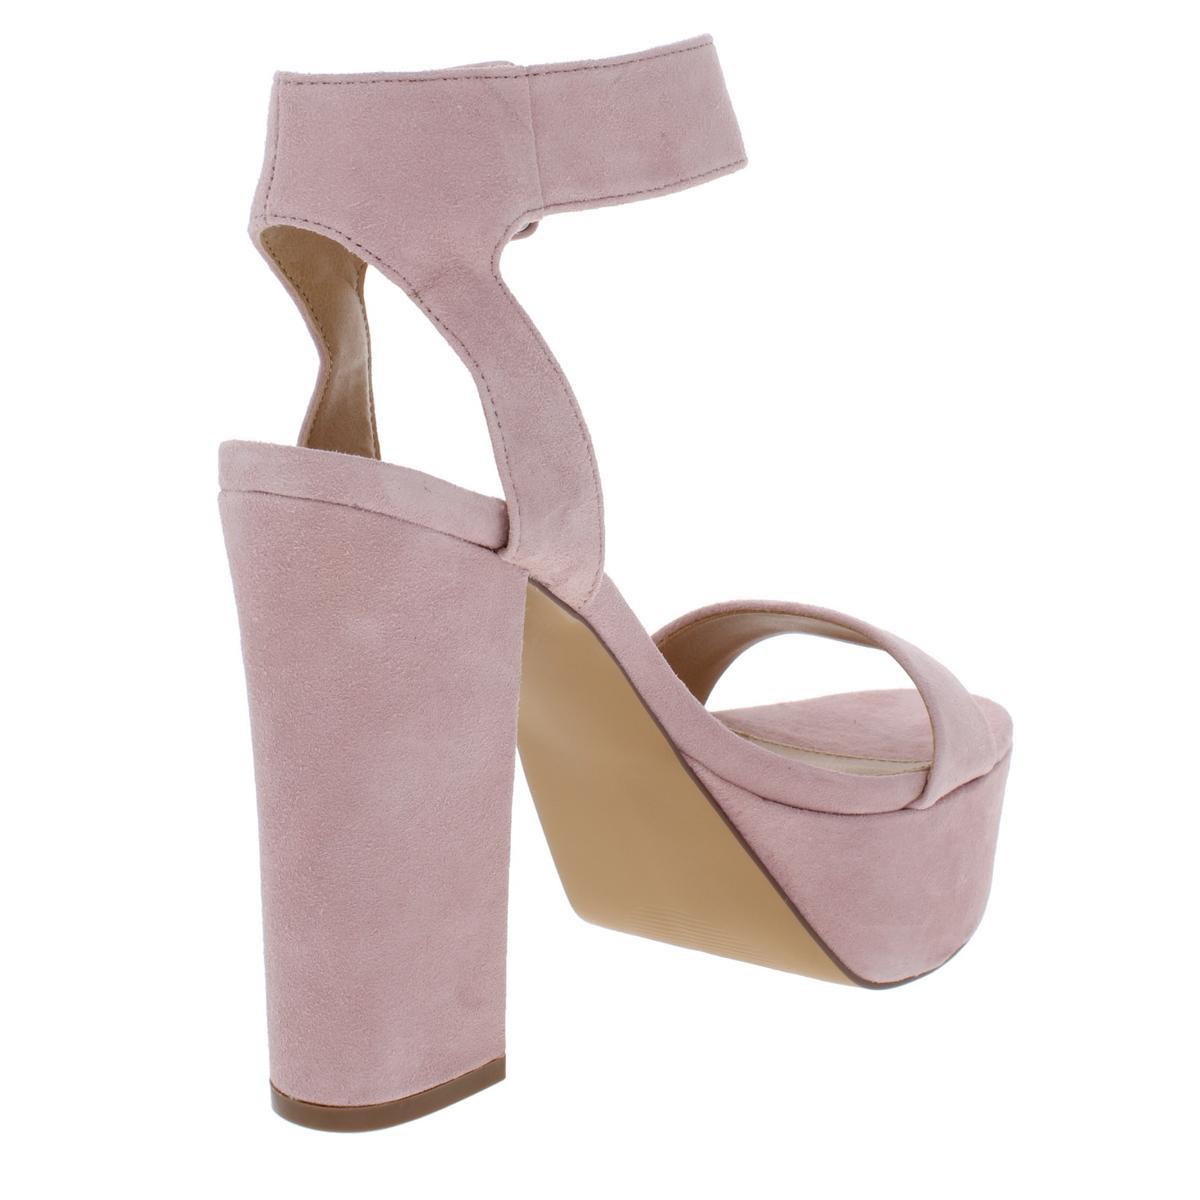 Steve-Madden-Womens-Joline-Suede-Covered-Heel-Platform-Sandals-Shoes-BHFO-8617 thumbnail 6